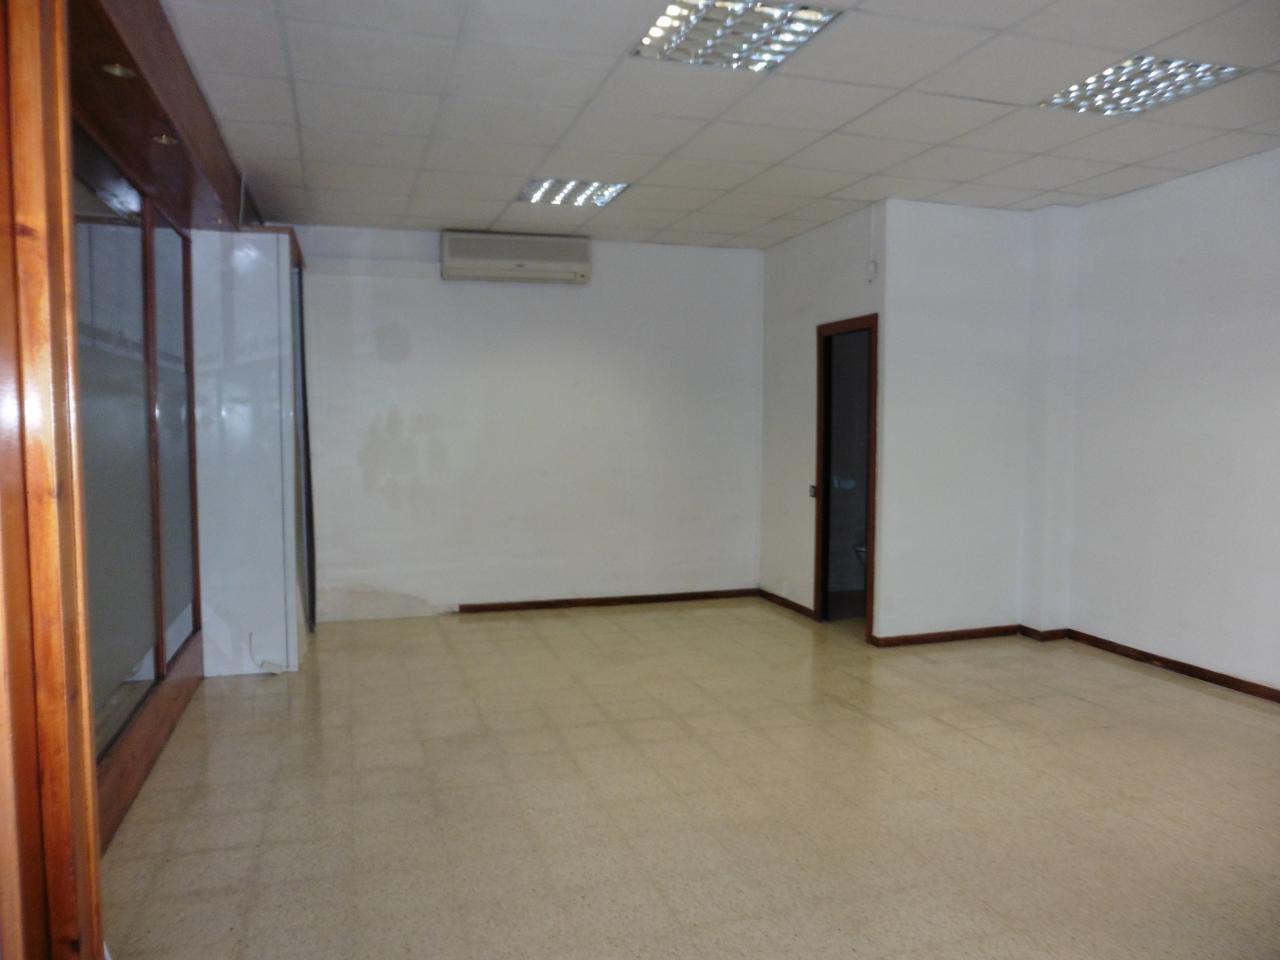 local-comercial en montmelo · passeig-de-les-corts-catalanes-08160 59050€